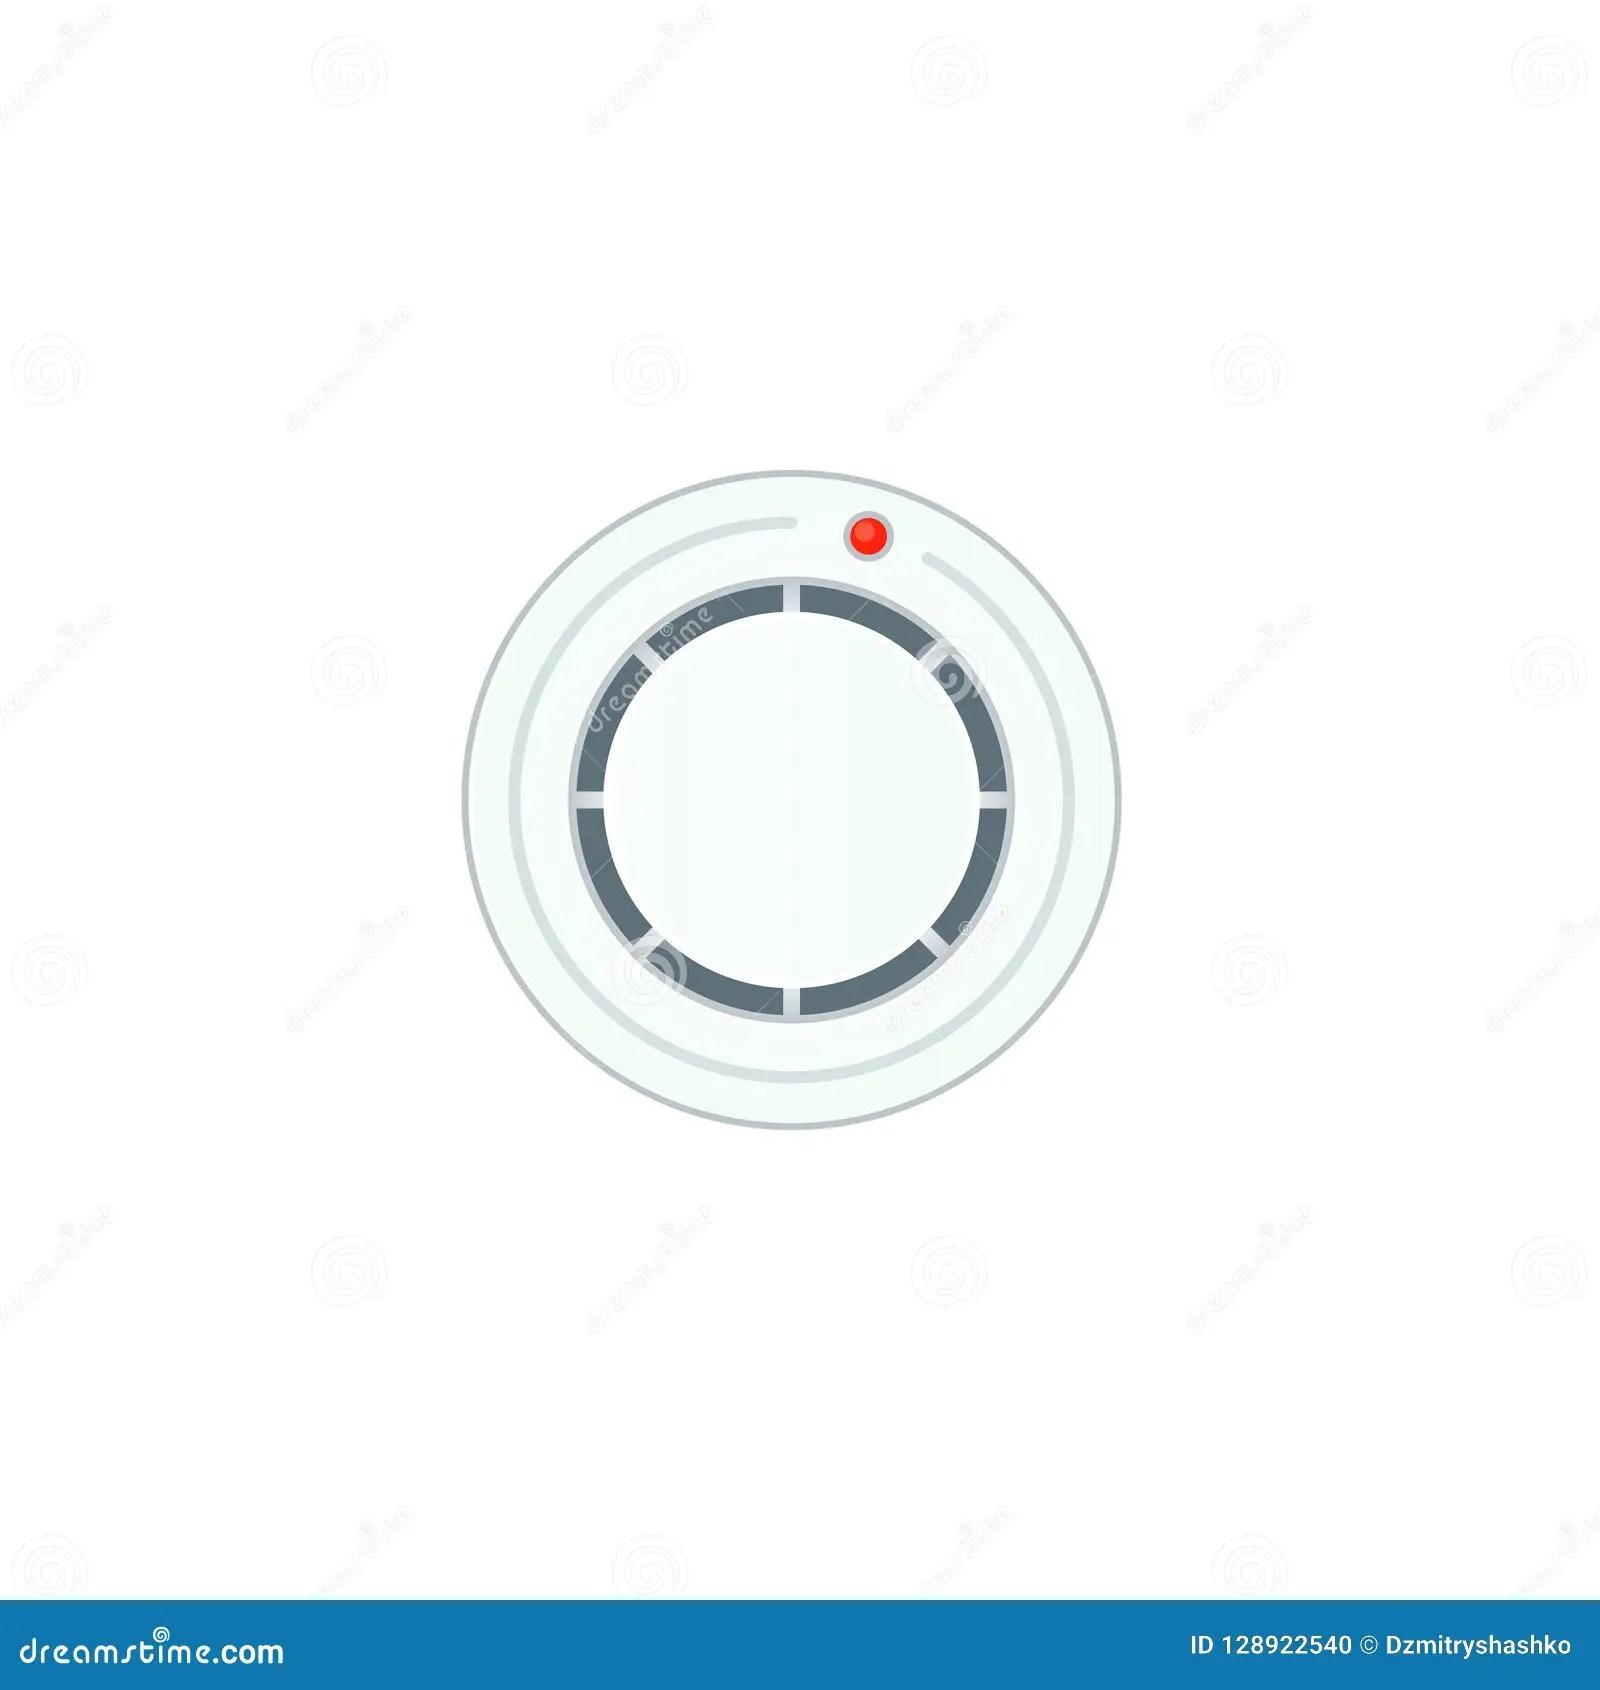 hight resolution of smoke alarm sensor icon clipart image isolated on white background